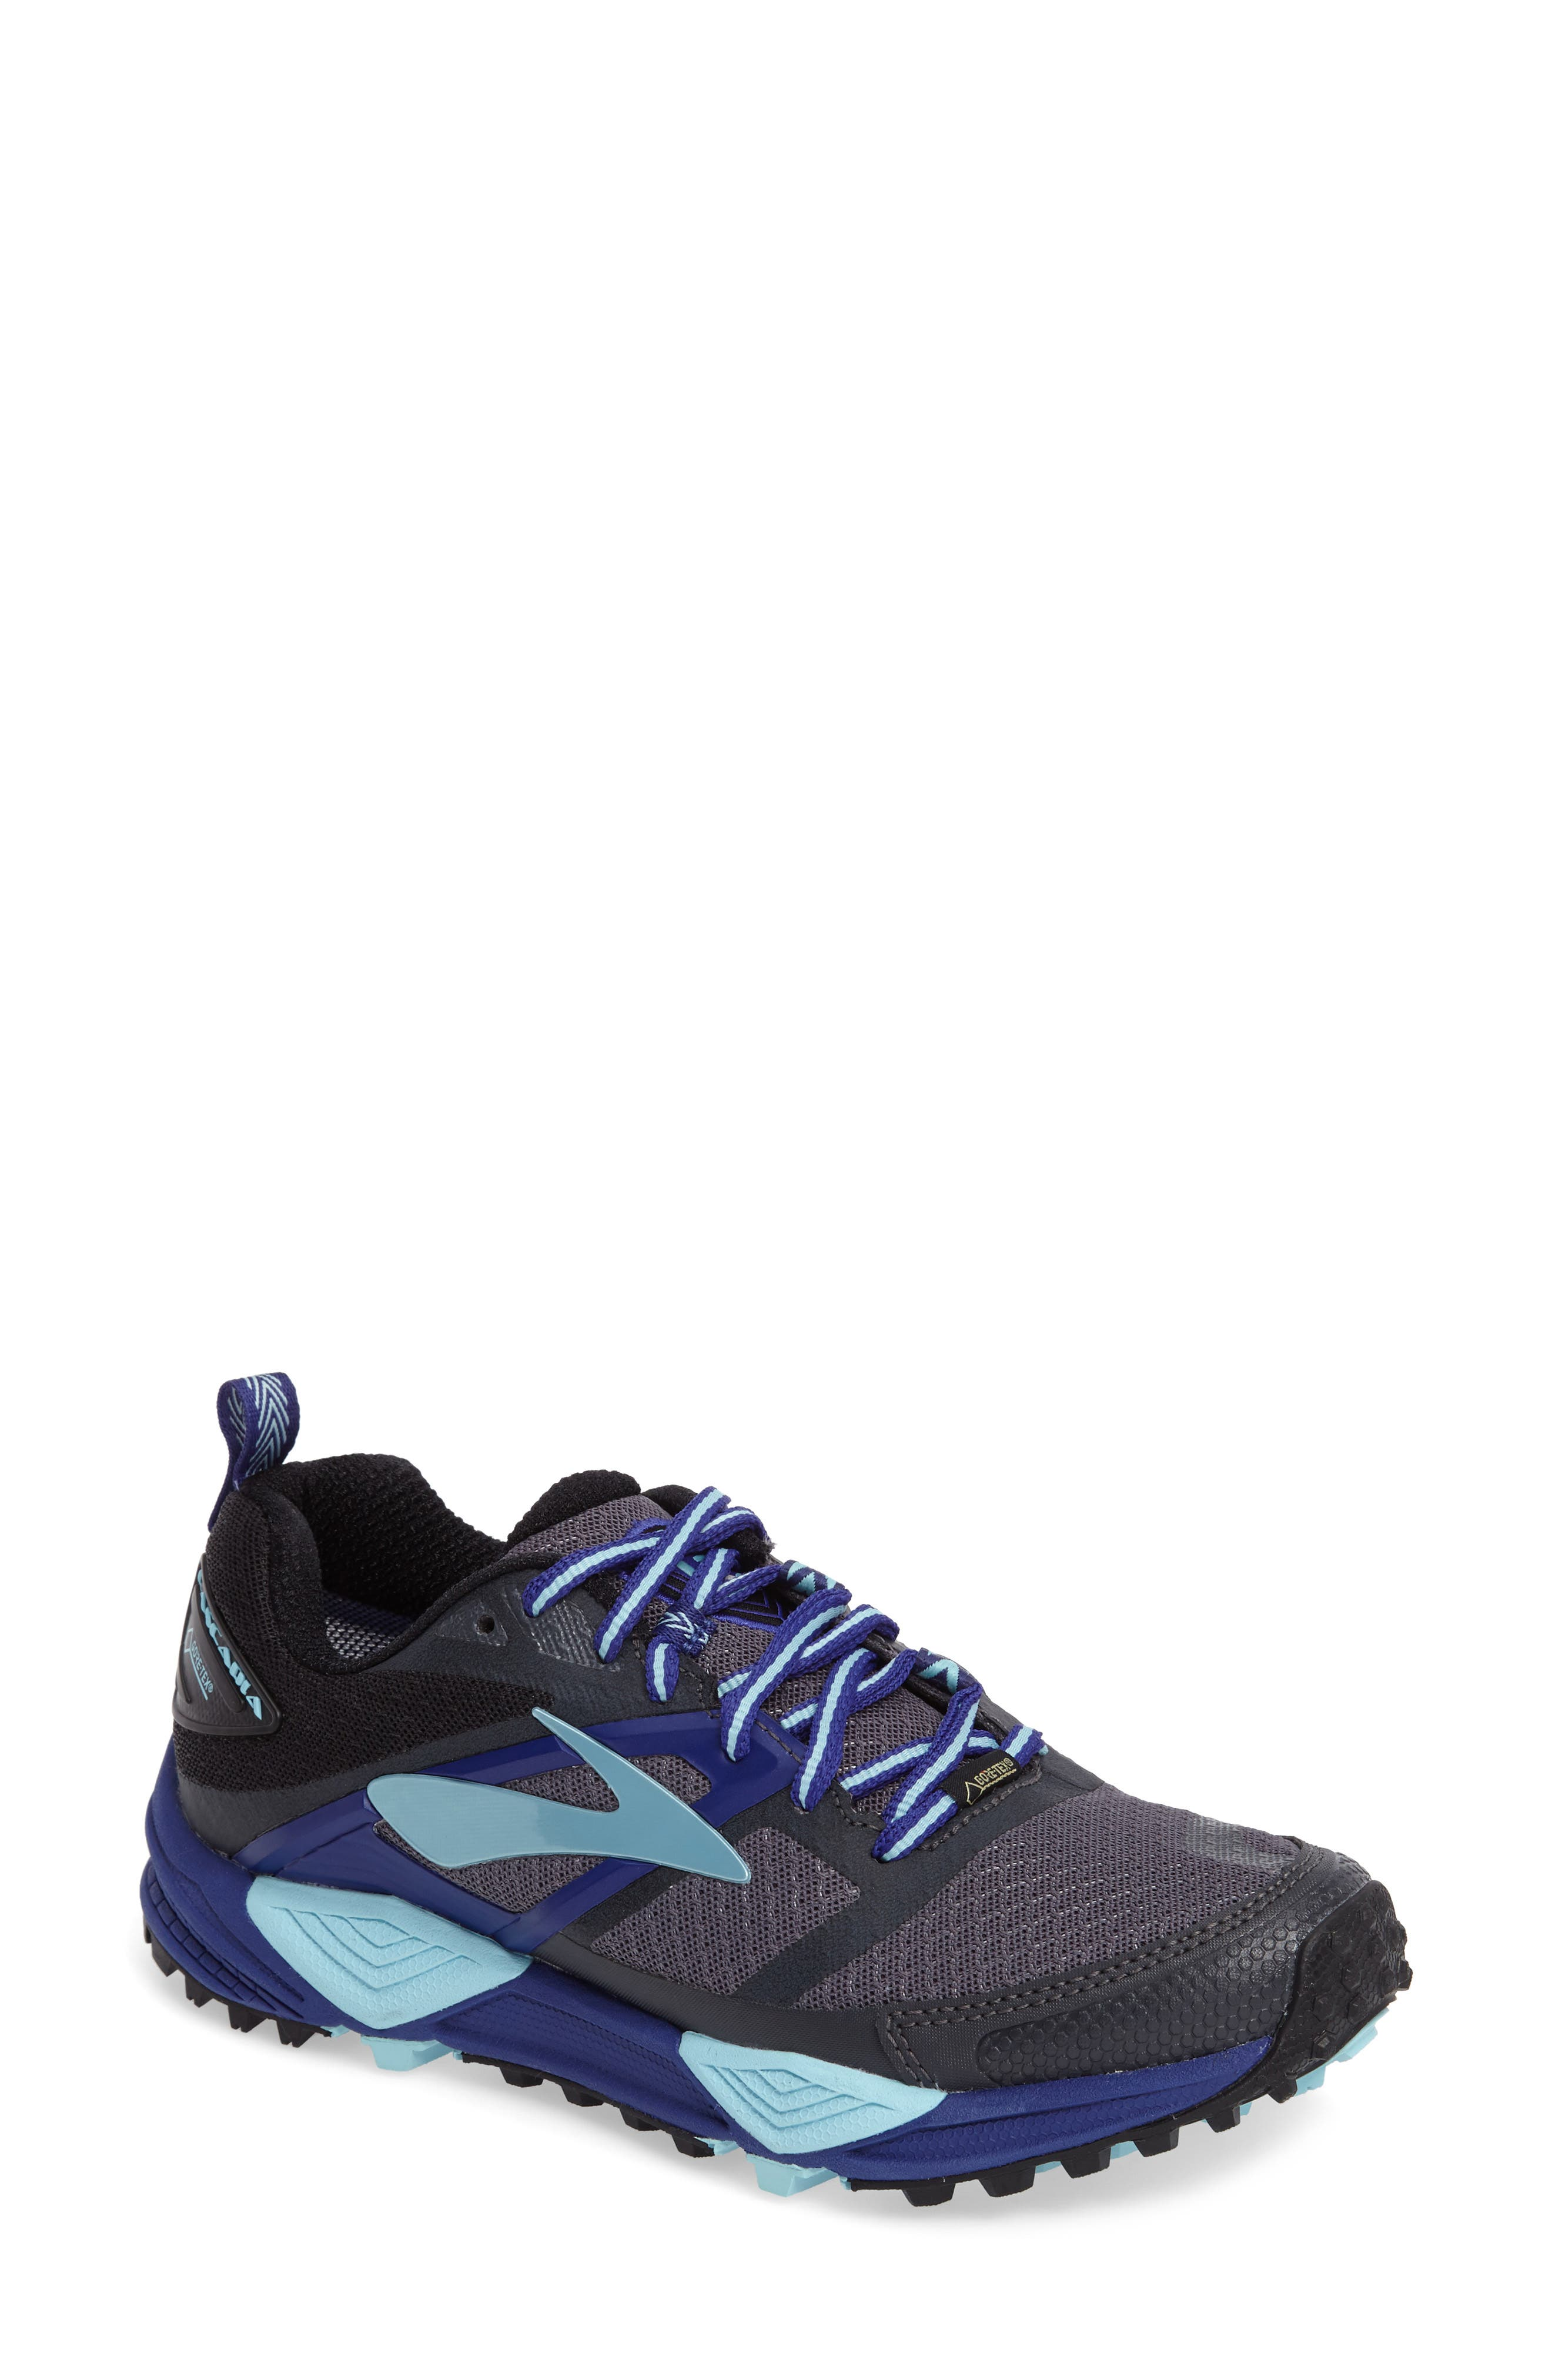 Cascadia 12 GTX Trail Running Shoe,                         Main,                         color, Black/ Ebony/ Clematis Blue